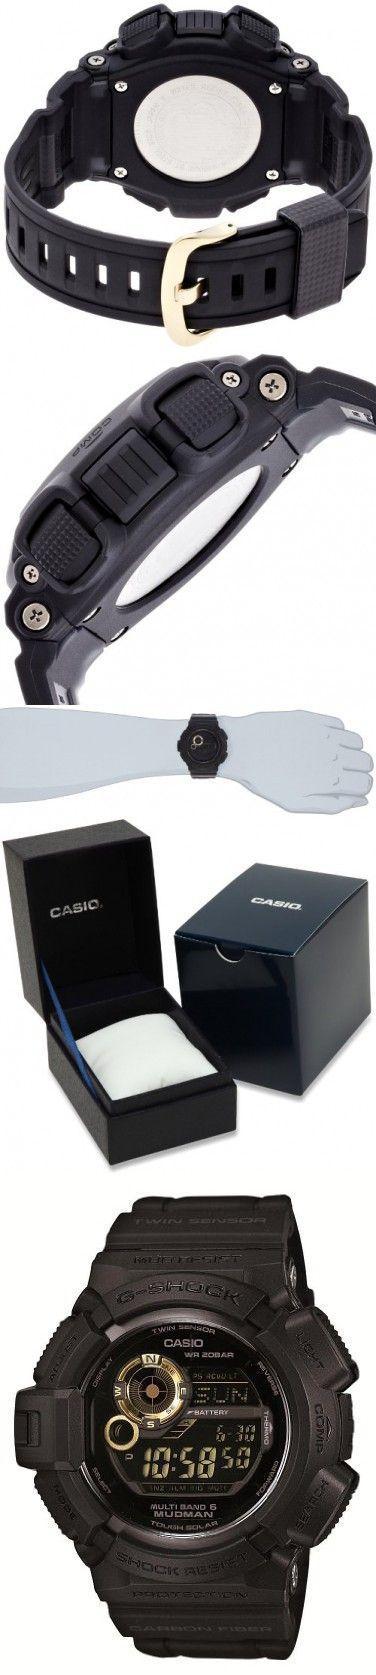 Casio G-shock Mudman Black X Gold Multiband6 Japanese Model [ Gw-9300gb-1jf ]